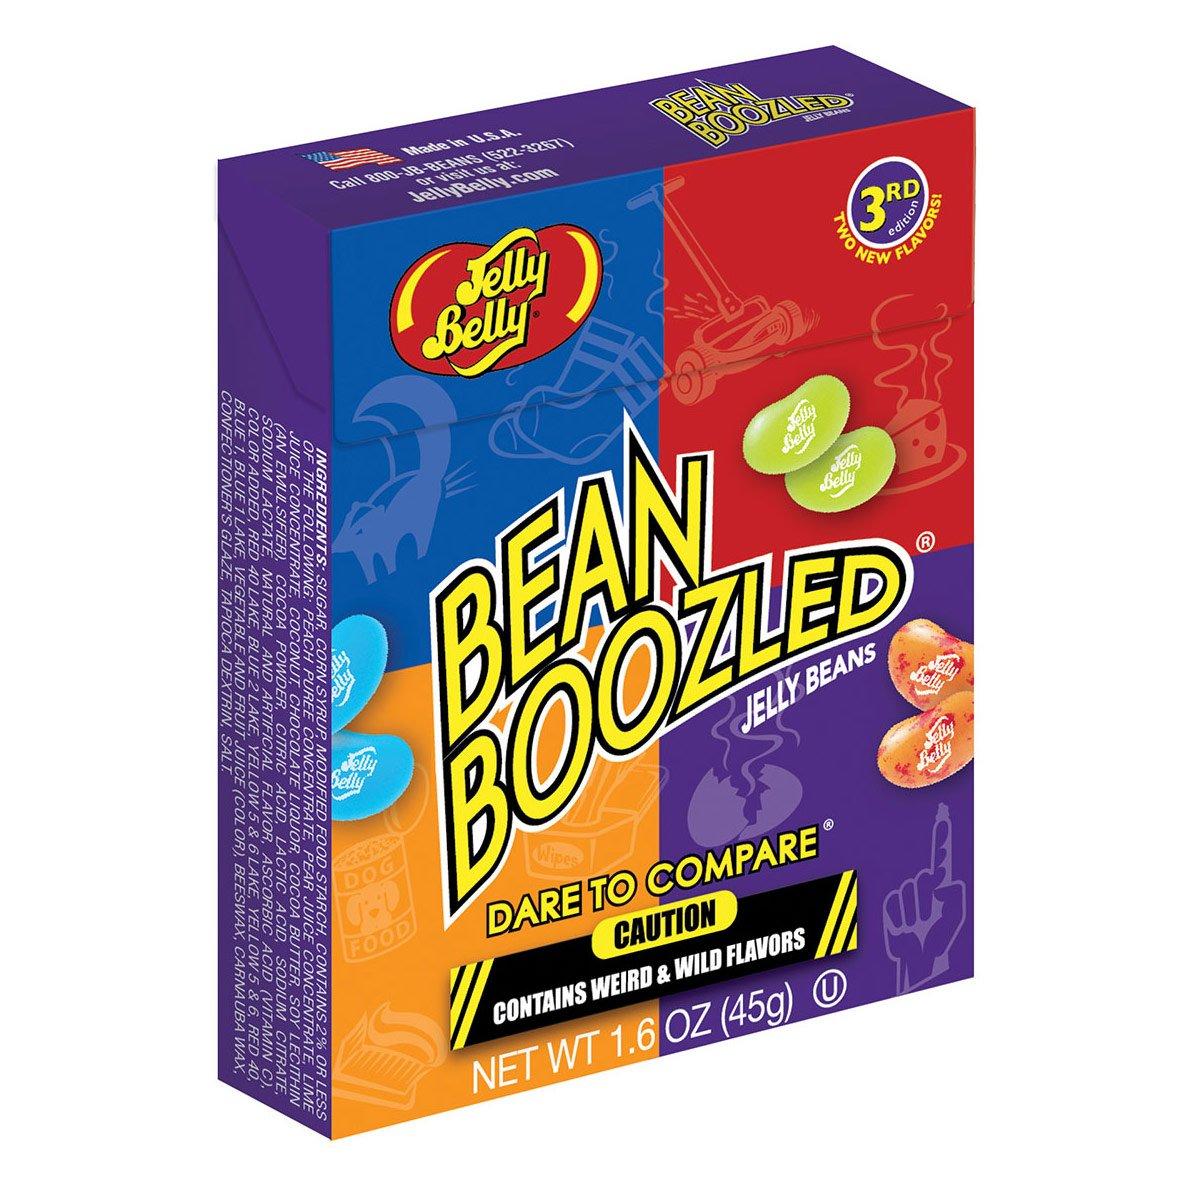 Bean Boozled Flip-Top-Box 3RD Edition Jelly Belly Beans 45g - (071567988612): Amazon.es: Alimentación y bebidas